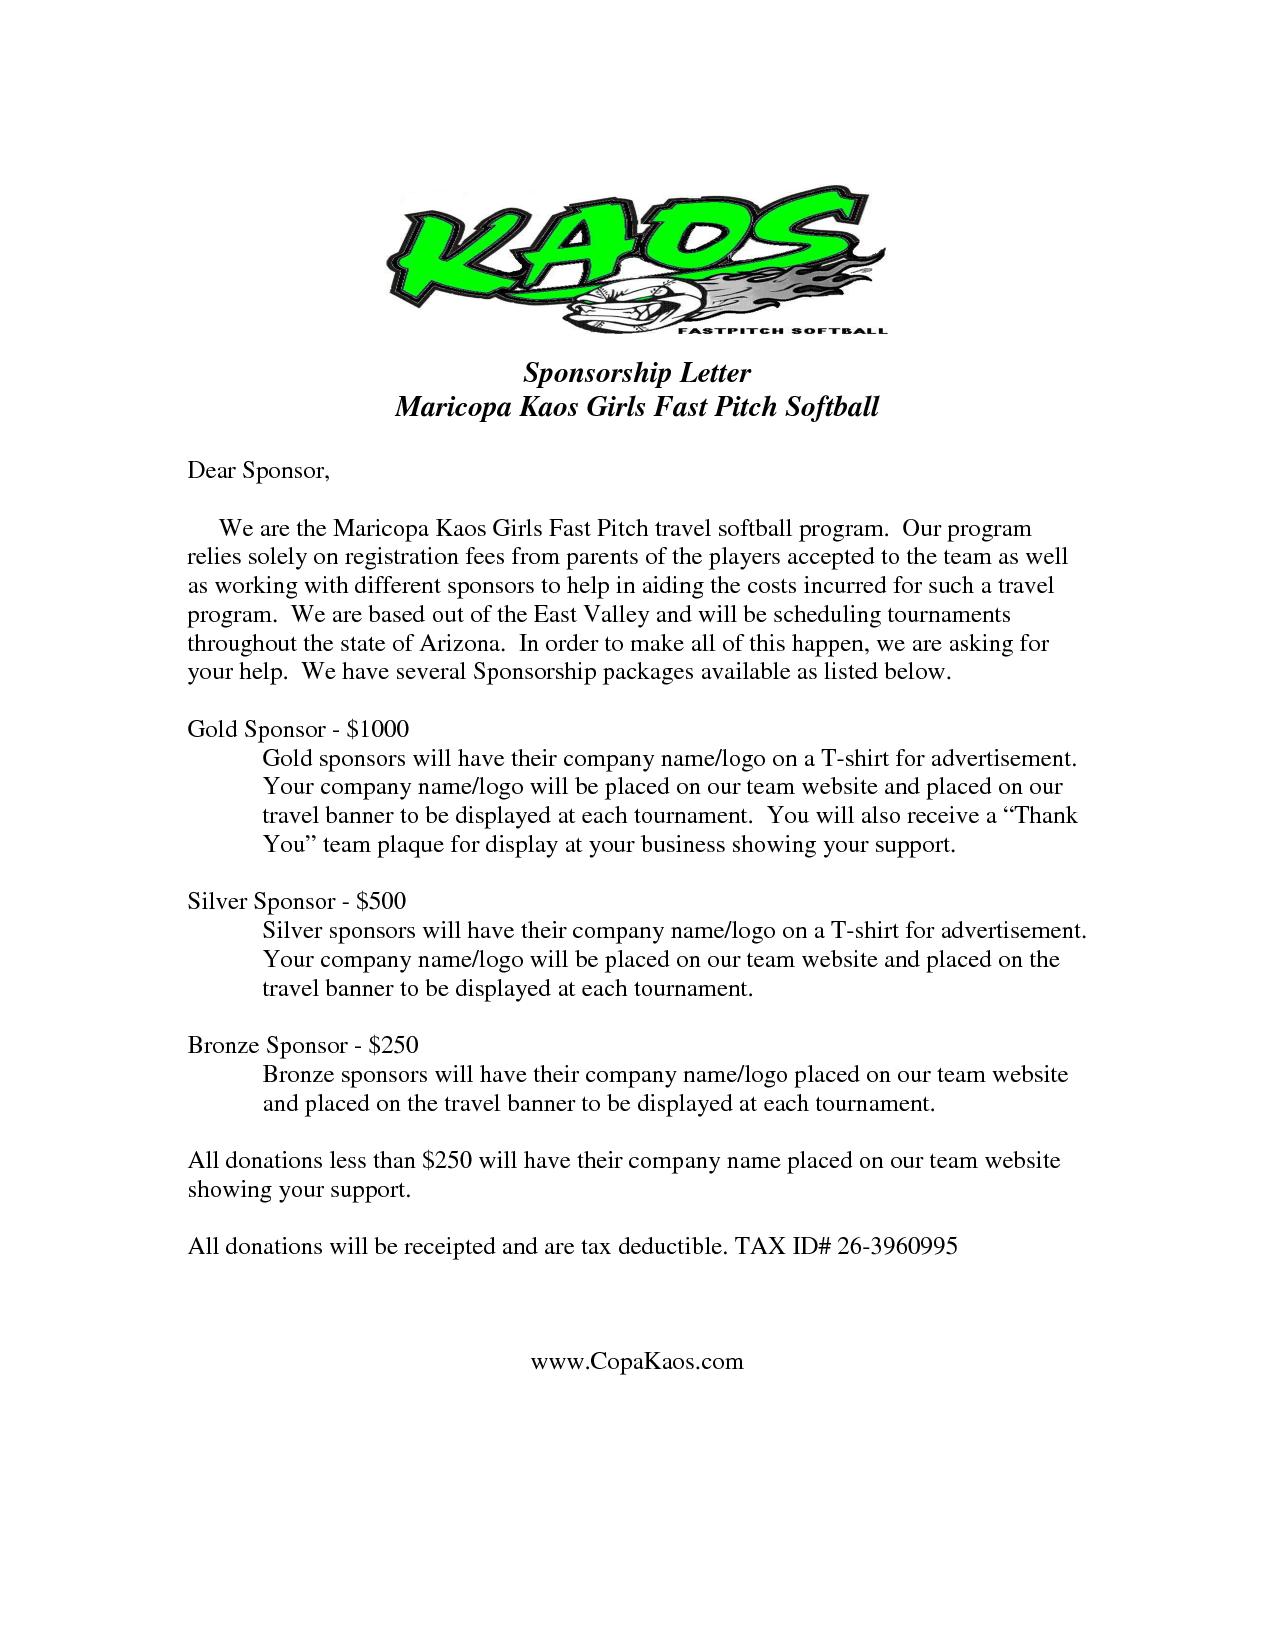 Donation Letter Template for Sports - Image Result for Sample Sponsor Request Letter Donation